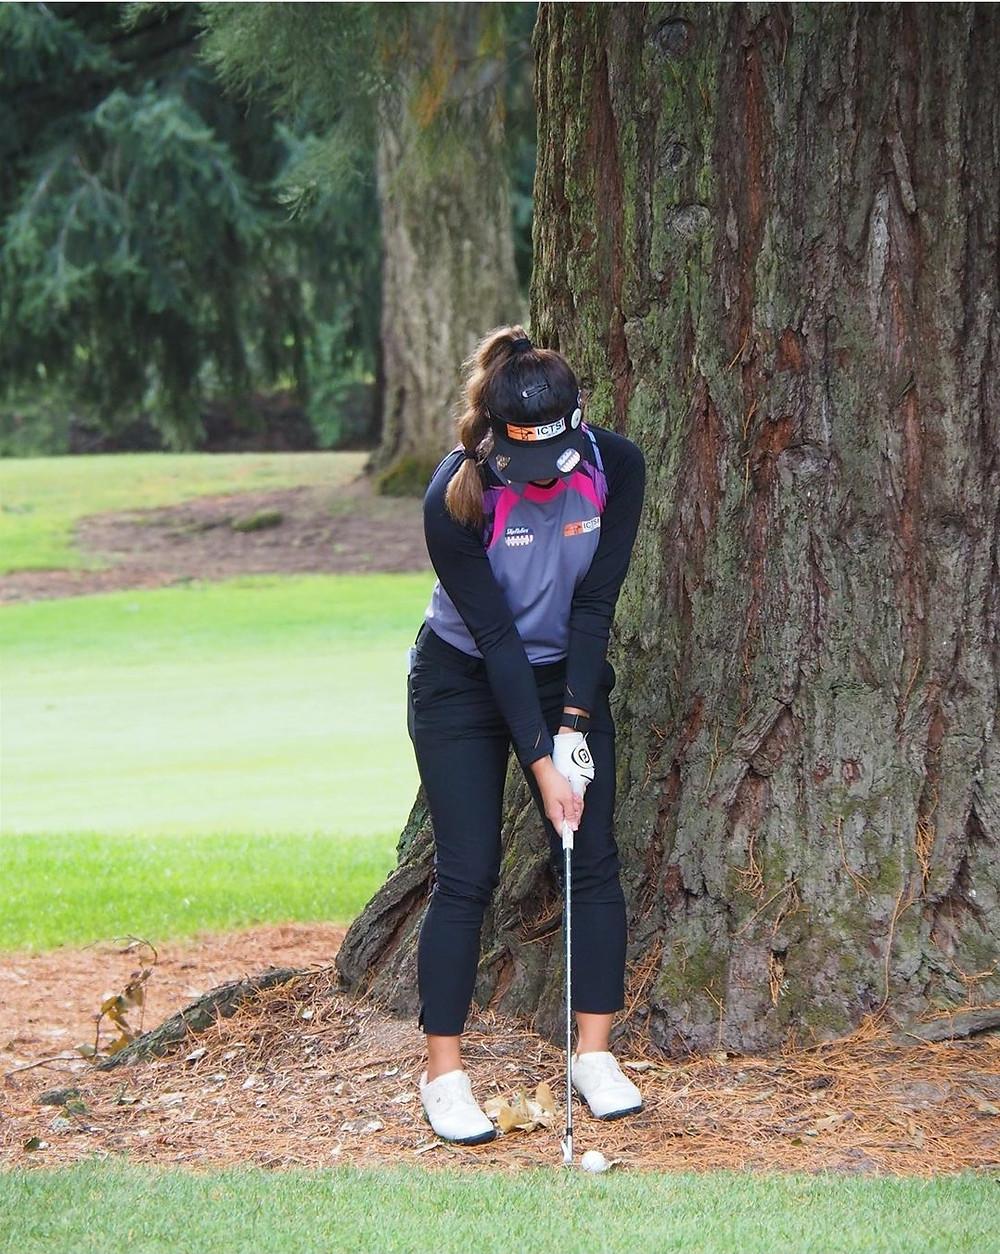 Golf, Cambia Classic, Bianca, LPGA, Filipina, Philippines